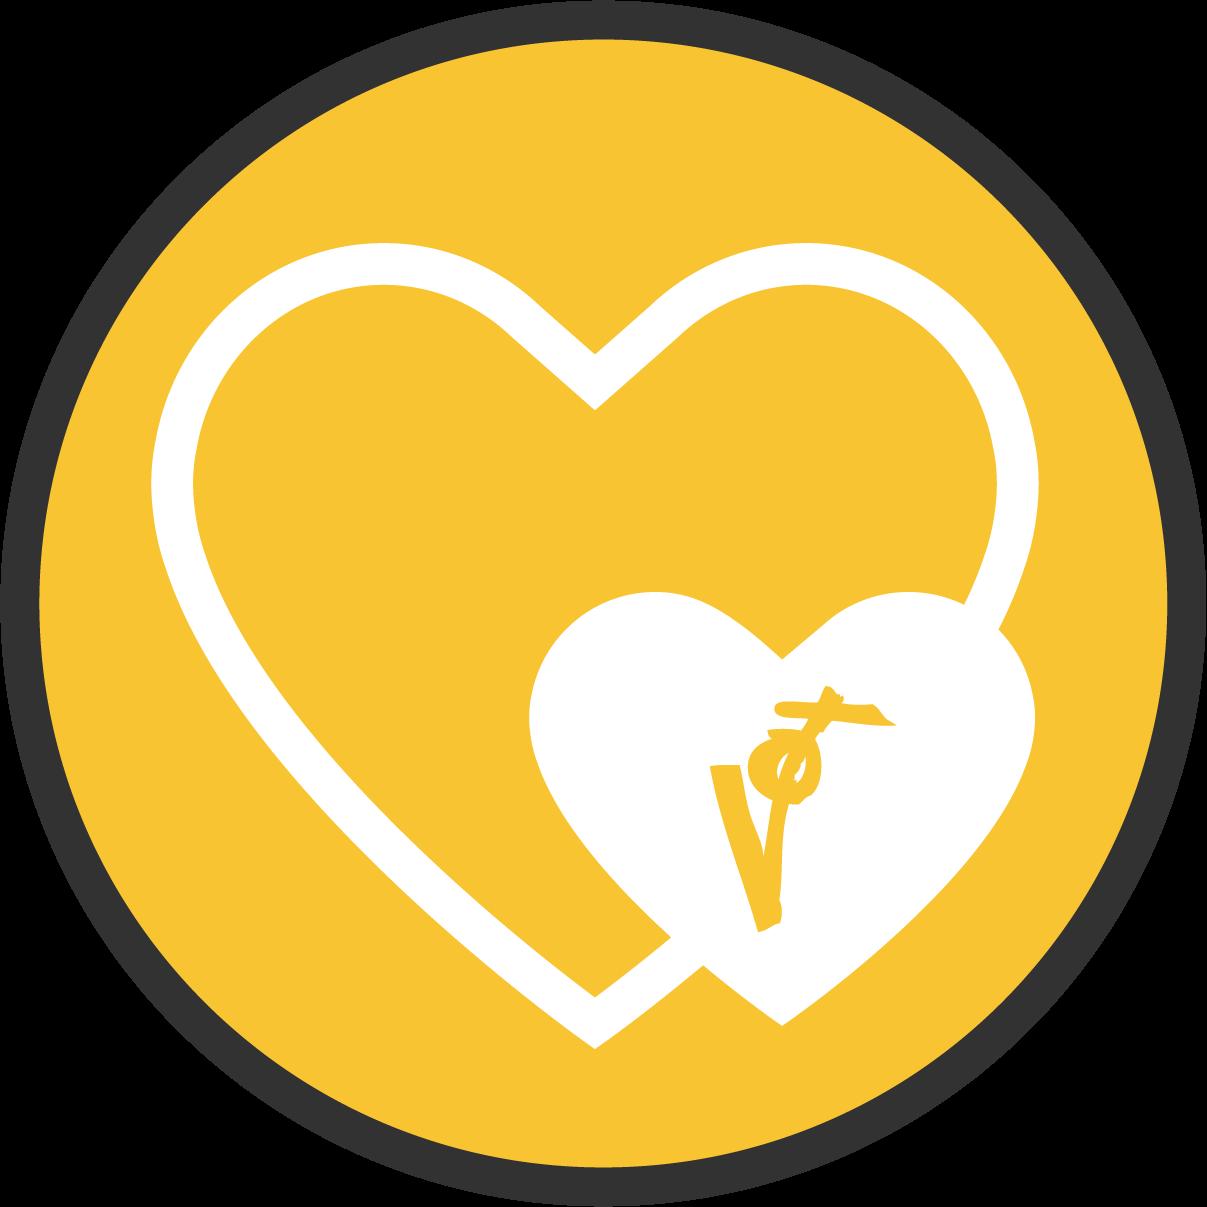 giving_logo_venus.png